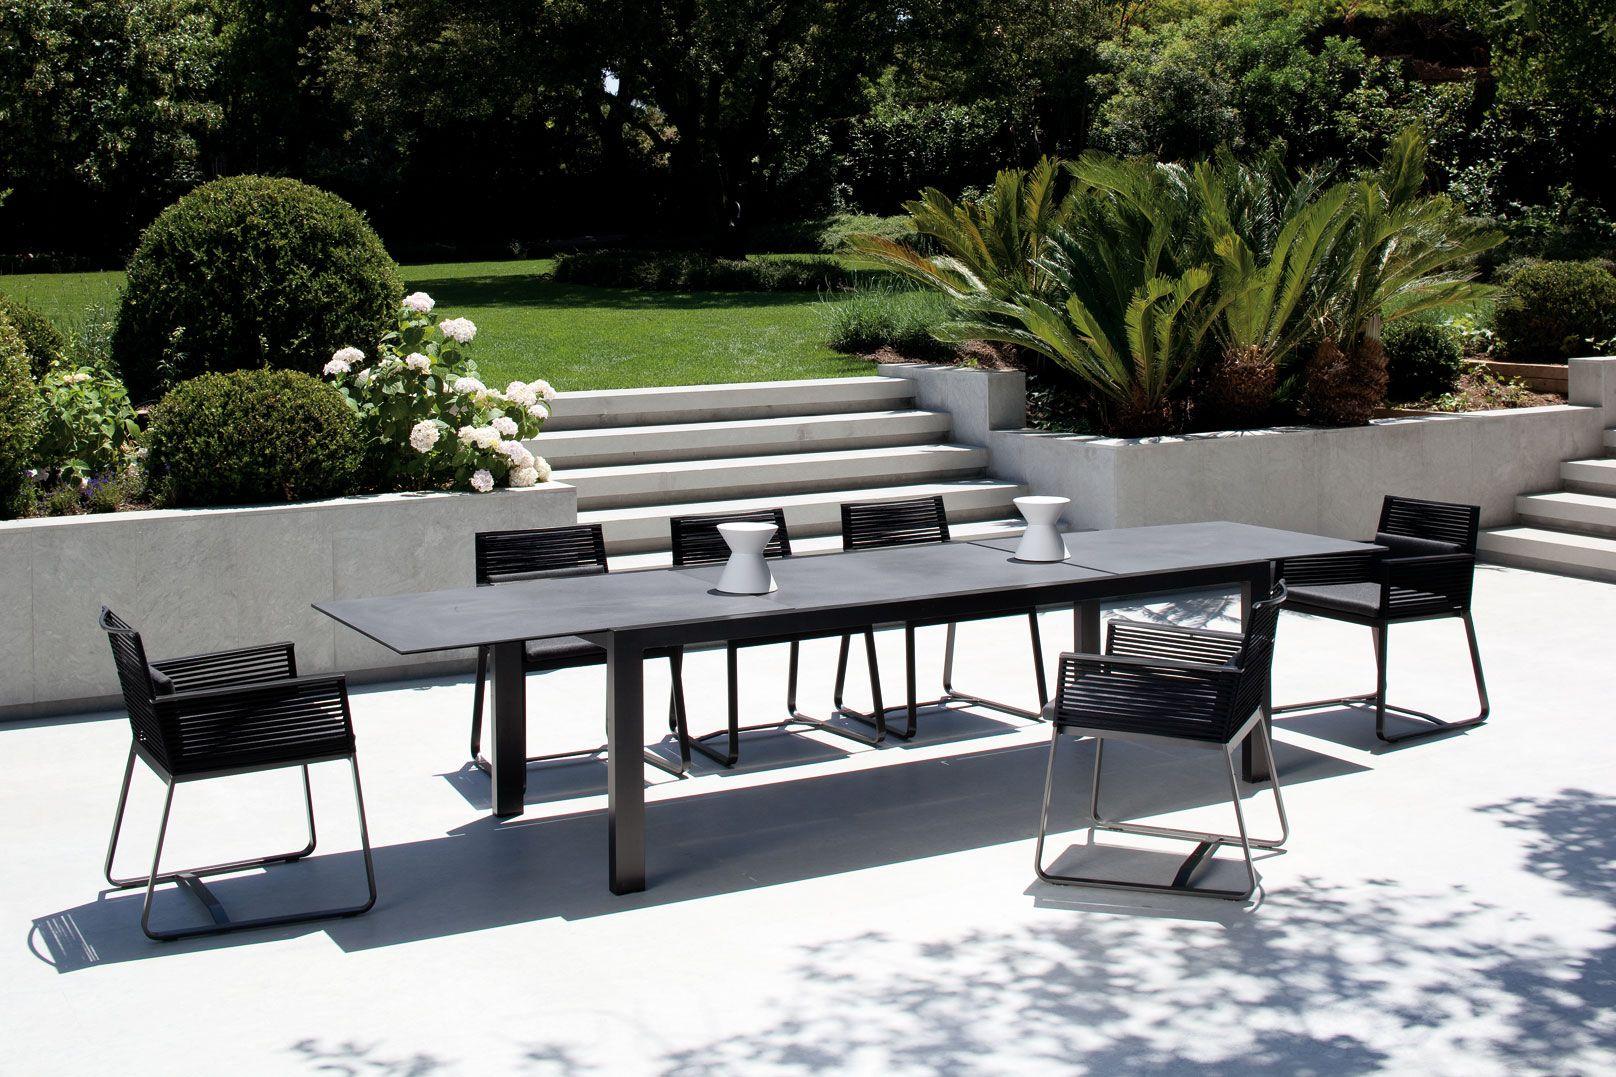 kettal landscape and bitta - Google Search | Mobilier jardin ...